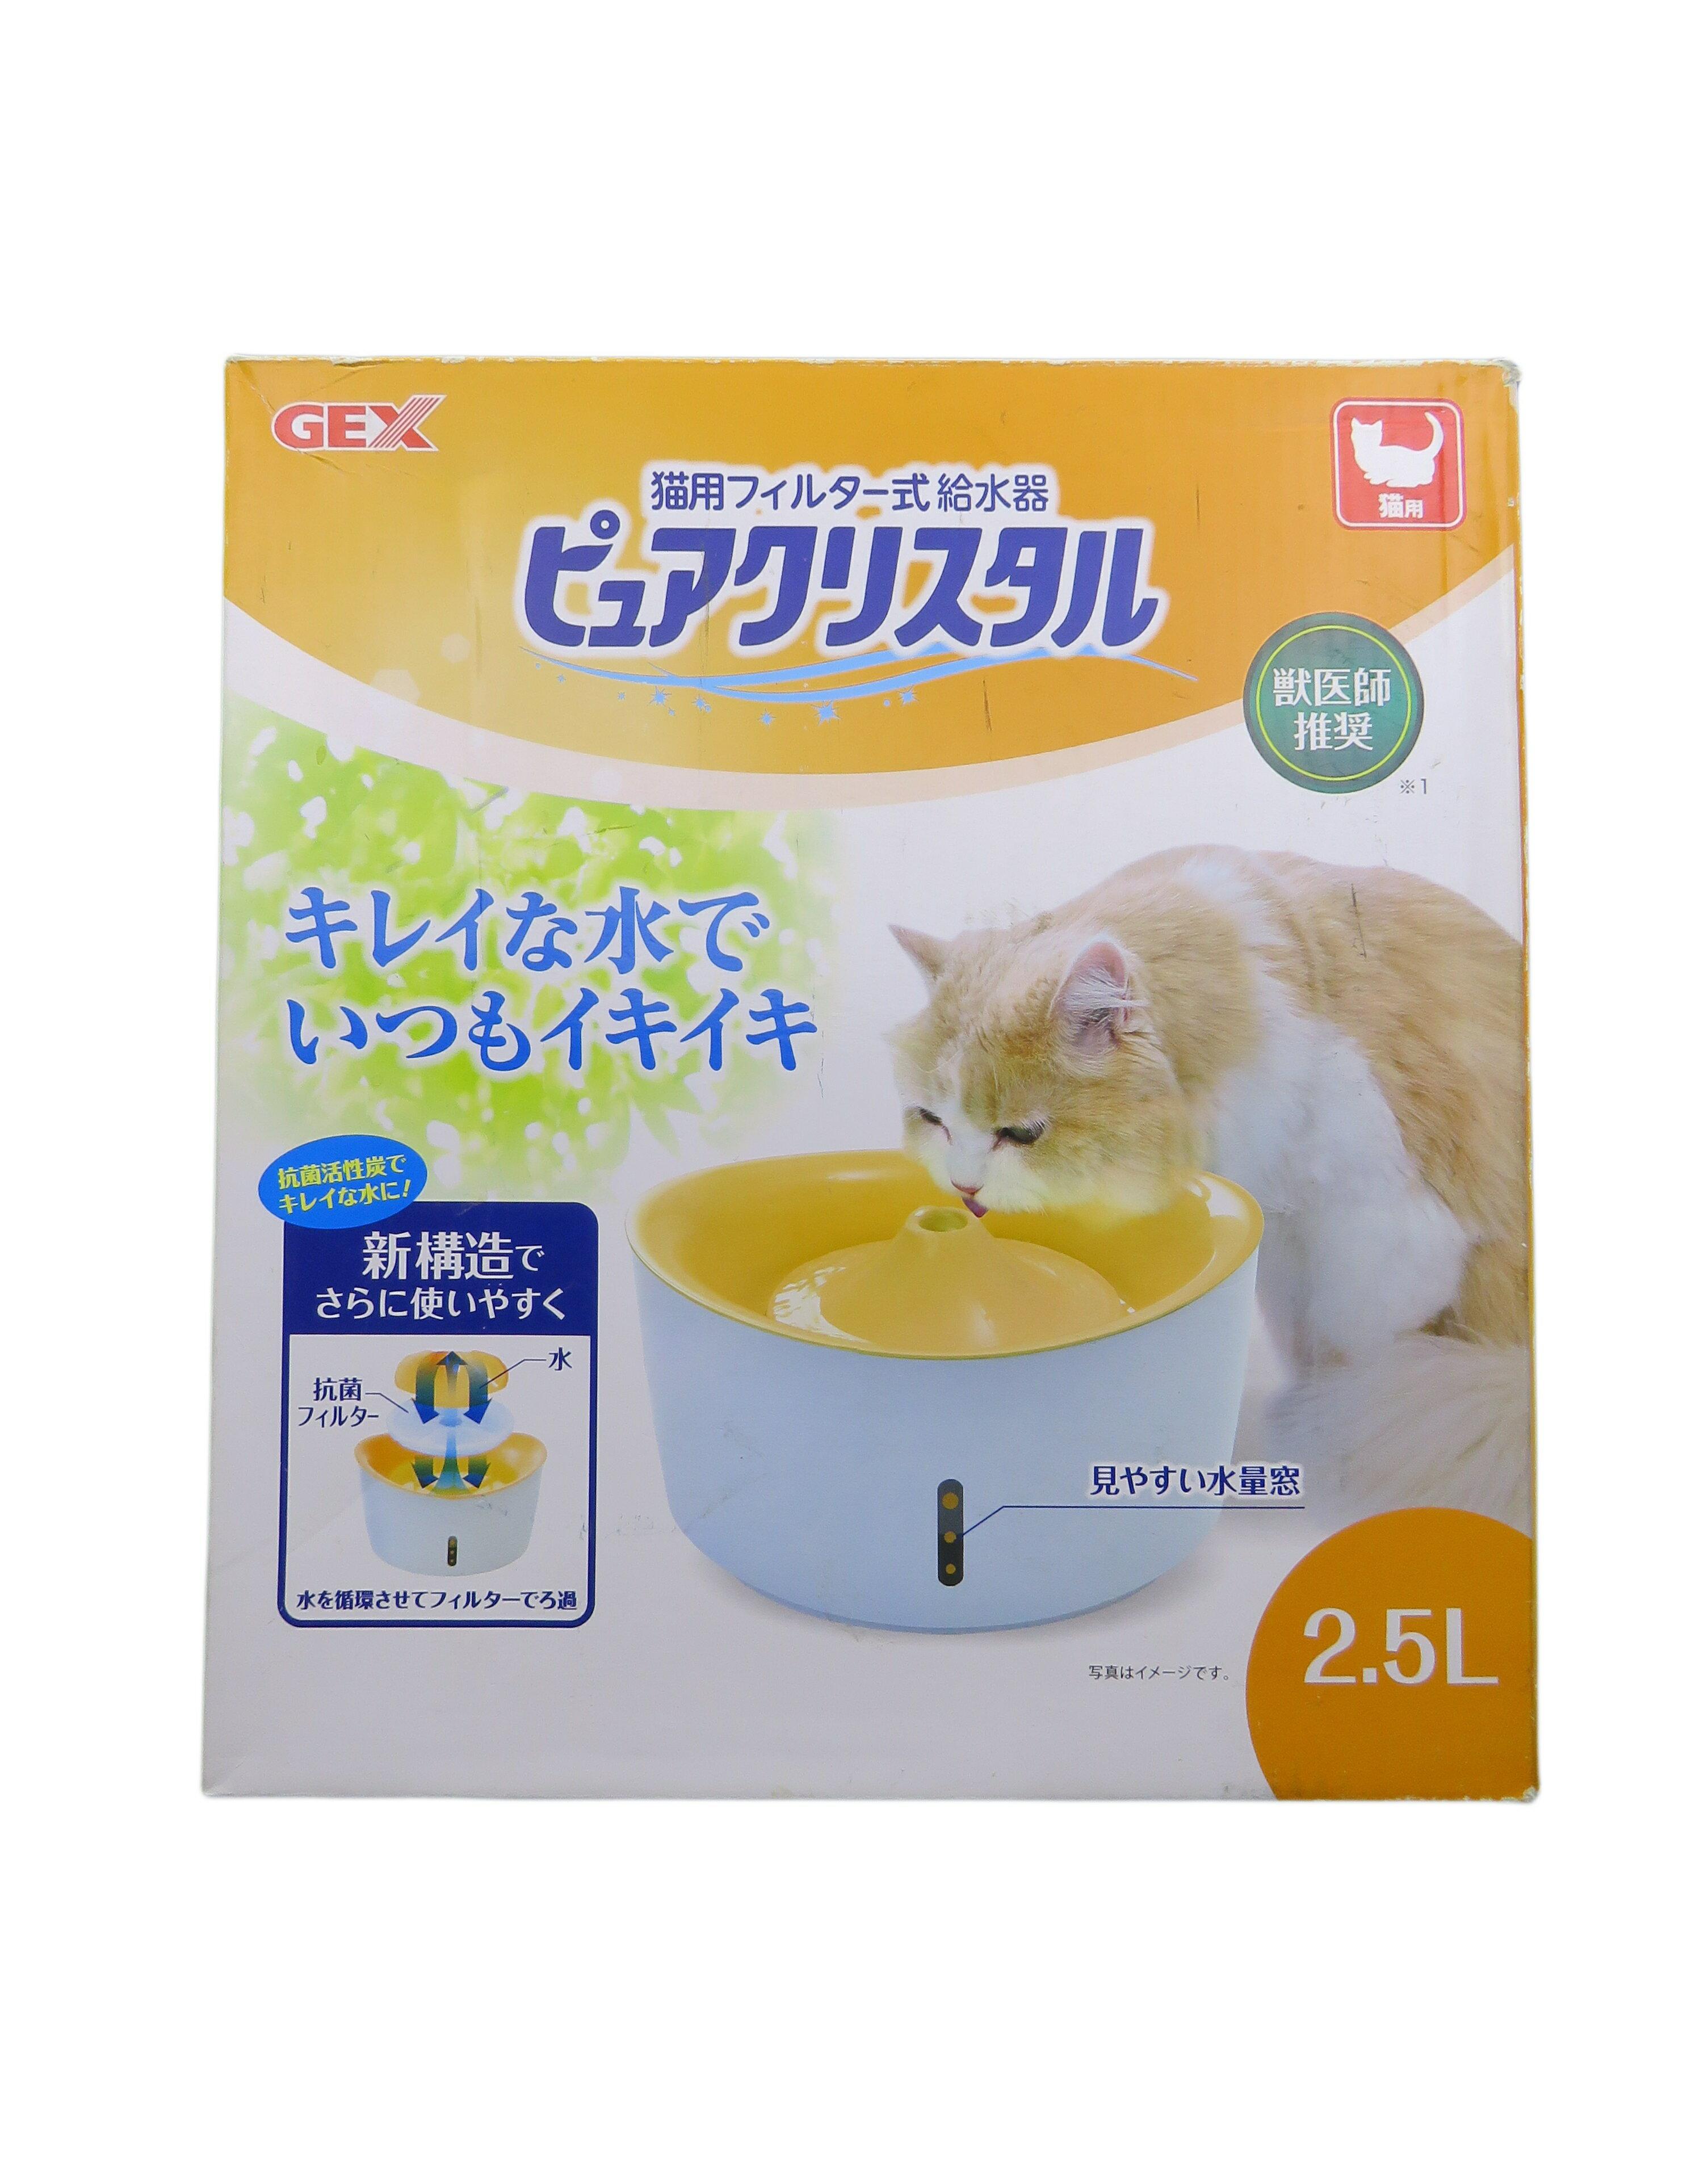 GEX 超方便視窗型 寵物貓用飲水機 流動飲水器 過濾飲水器 2.5L